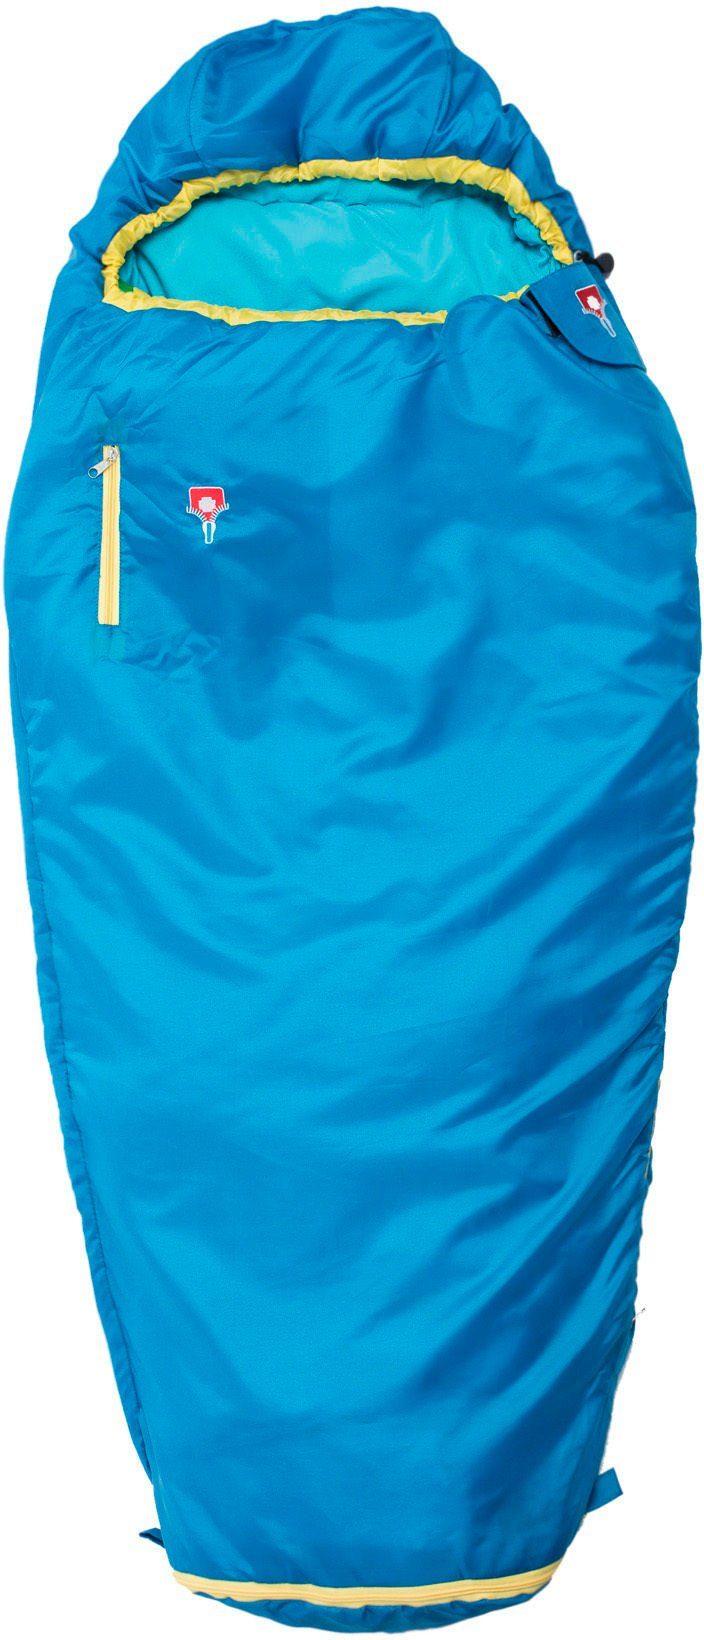 Grüezi bag Wanderrucksack »Grow Colorful Sleeping Bag Kids«